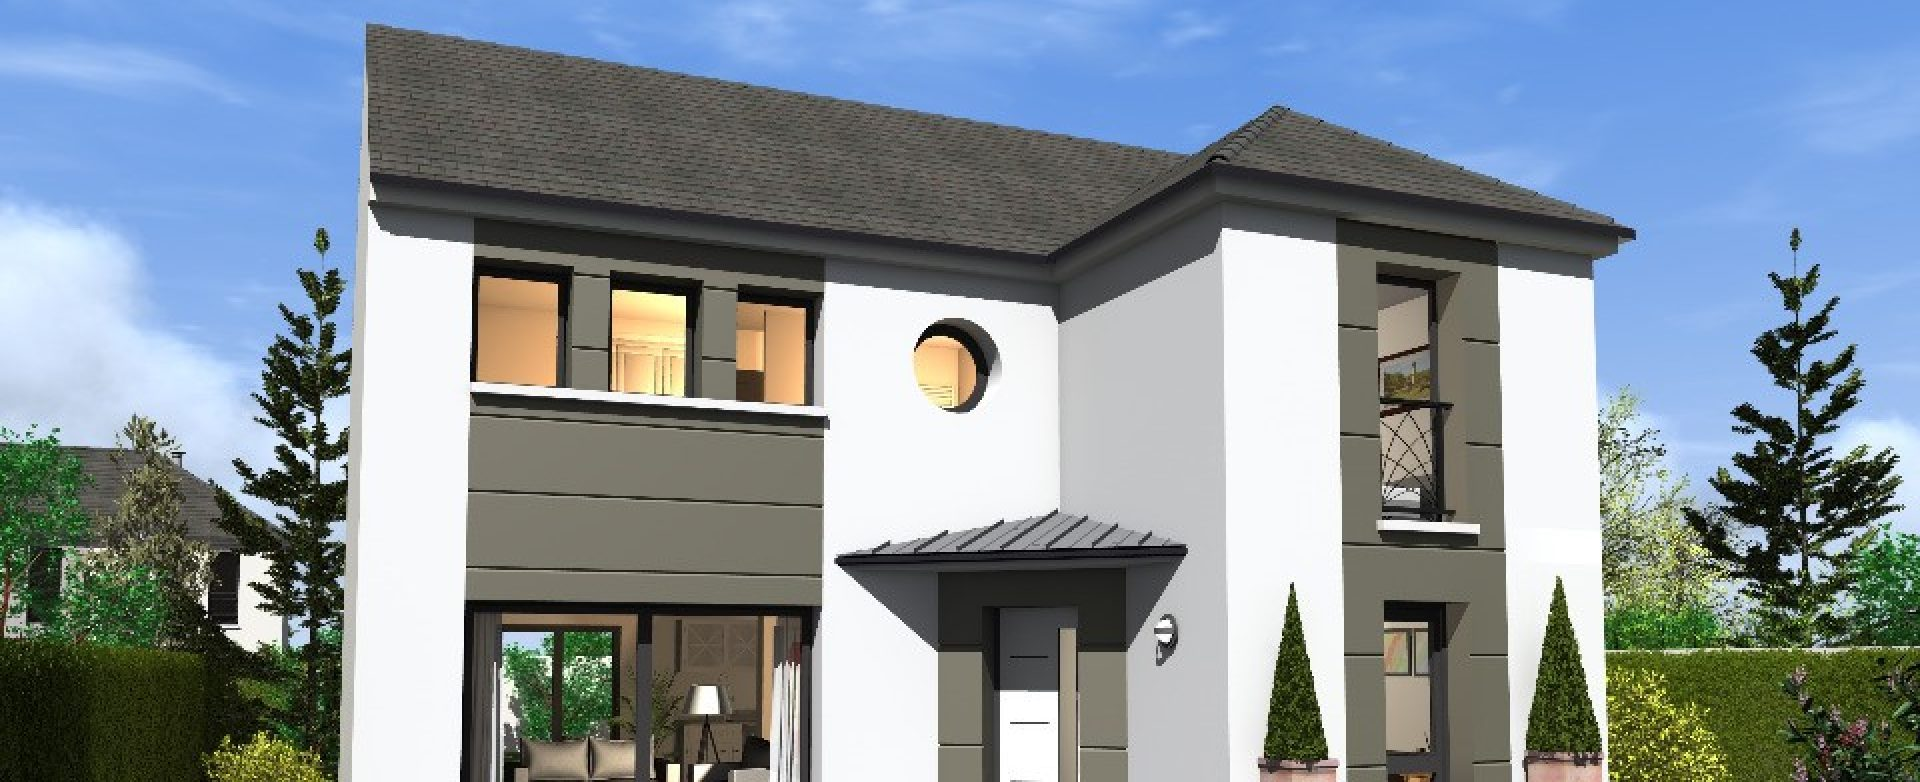 Maison neuve à Savigny sur Orge (91600)